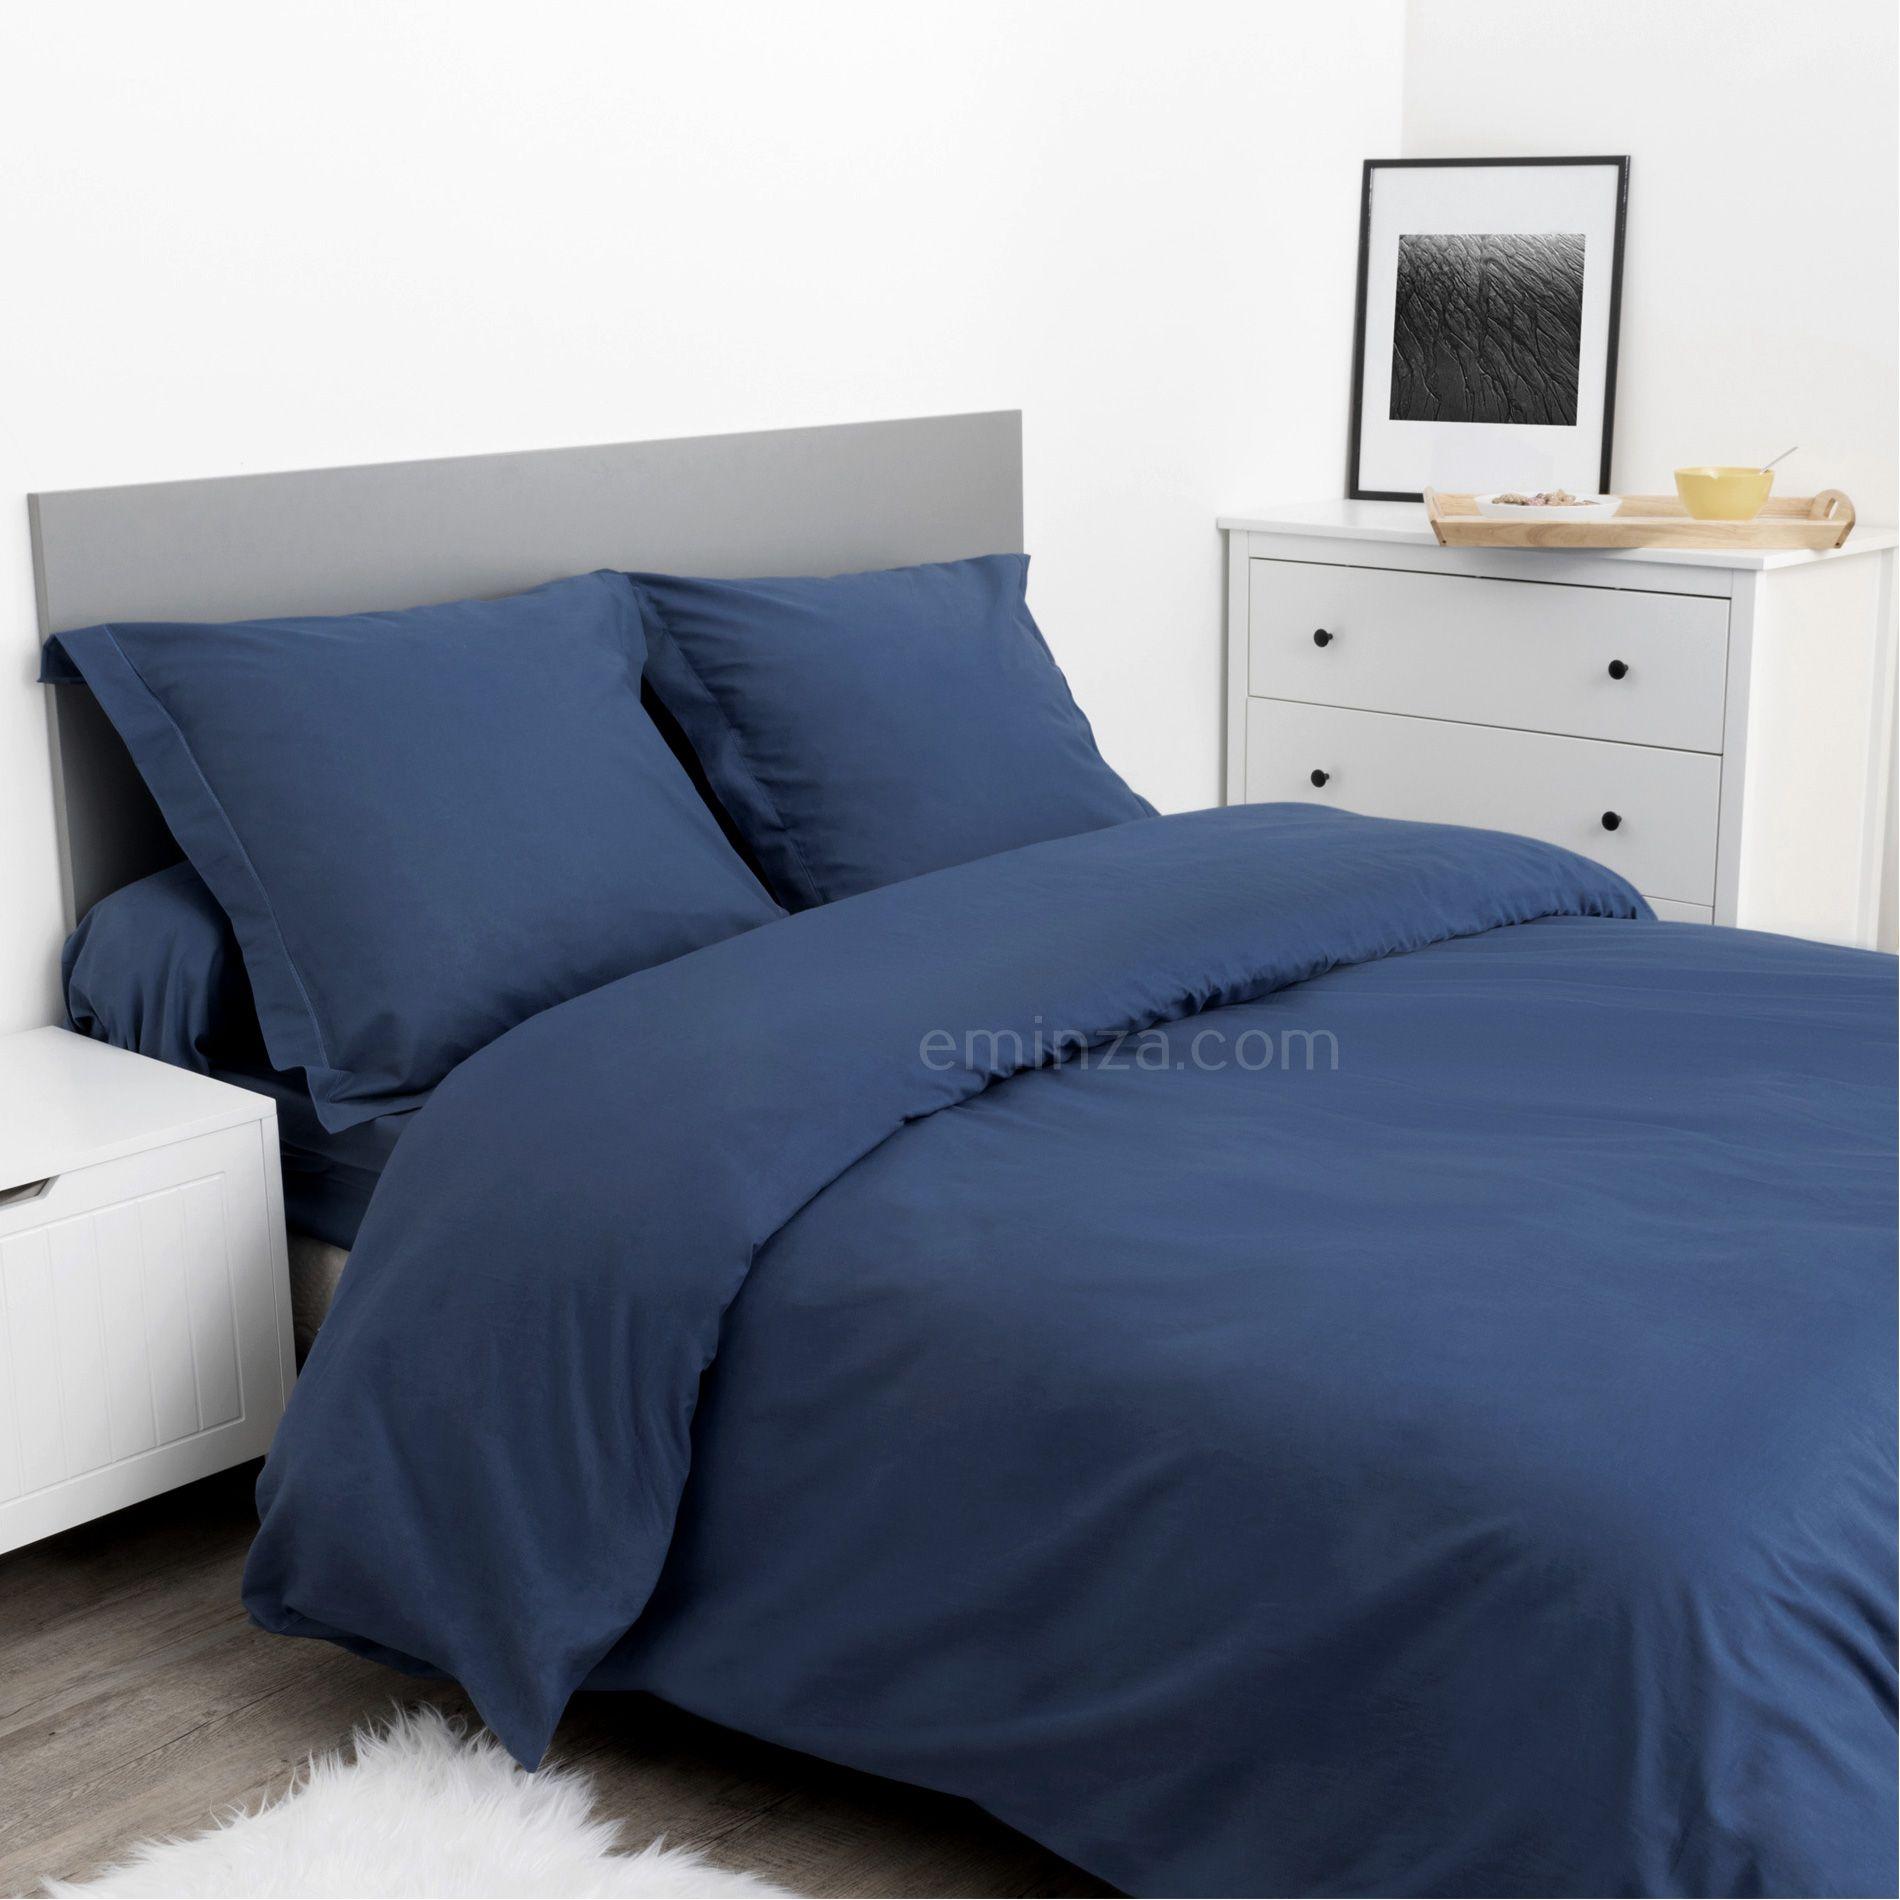 taie d 39 oreiller rectangulaire confort bleu taie d 39 oreiller traversin eminza. Black Bedroom Furniture Sets. Home Design Ideas